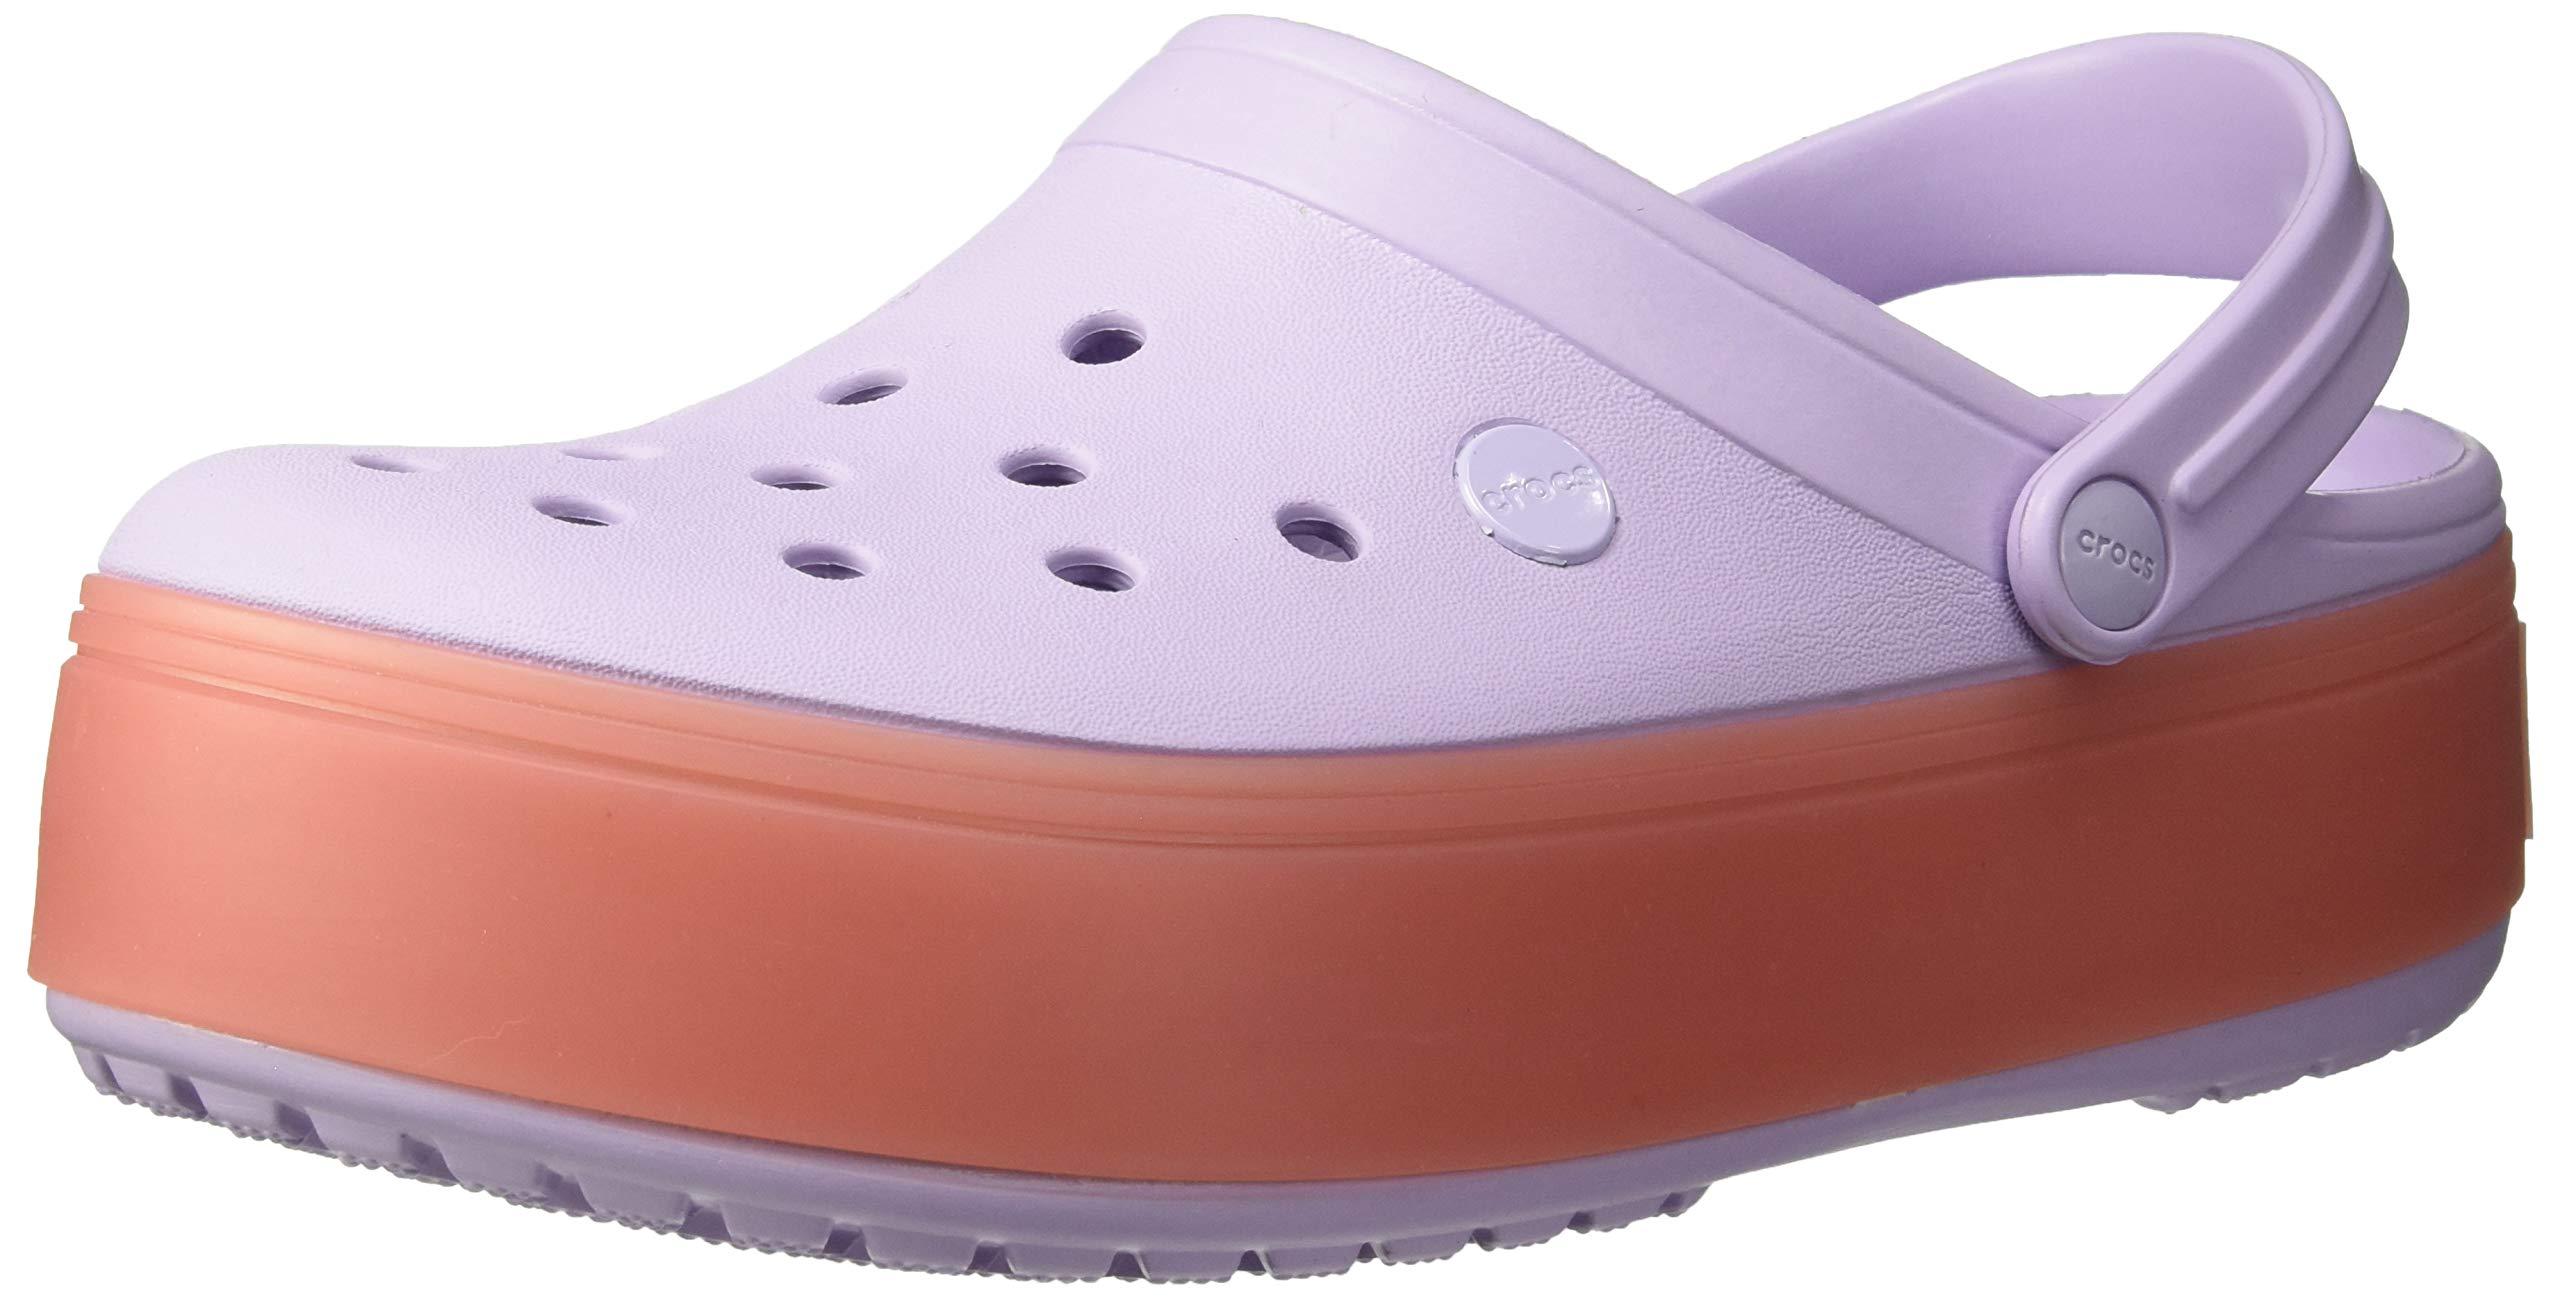 f3561a9ecf433 Galleon - Crocs Crocband Platform Clog Shoe